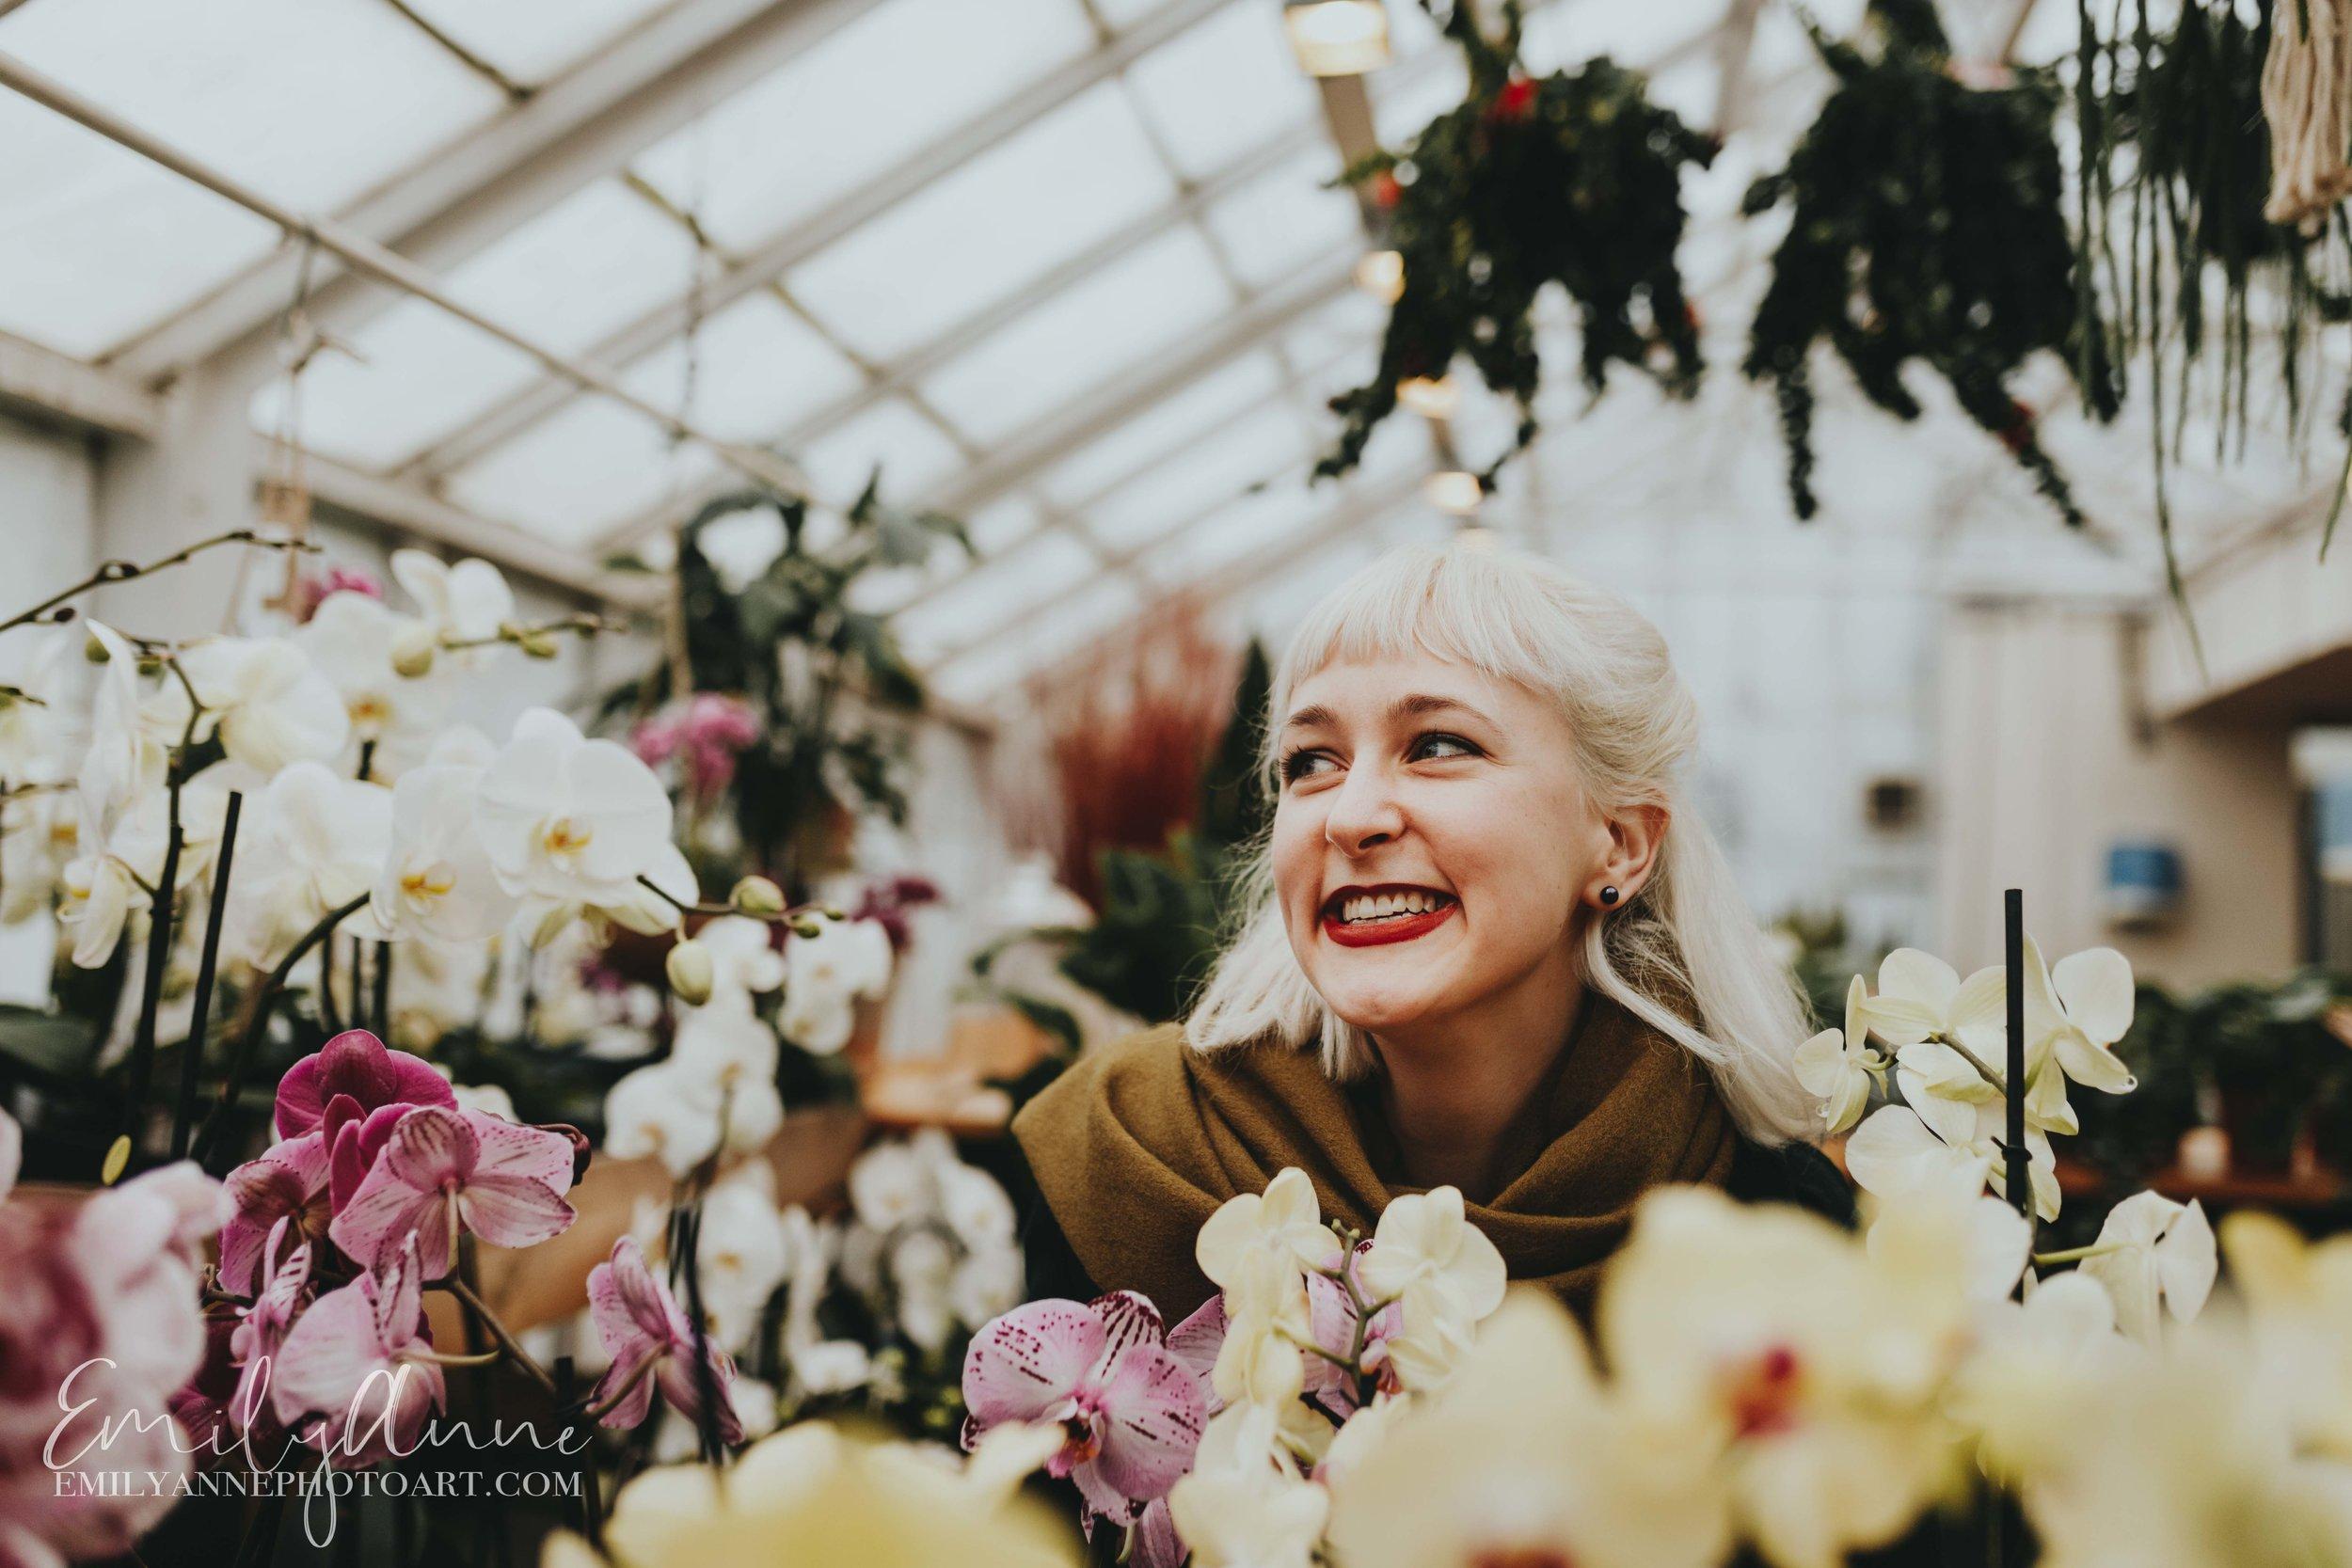 portrait close up best shots shooting in flowers for modeling headshots unique emily Anne photo art